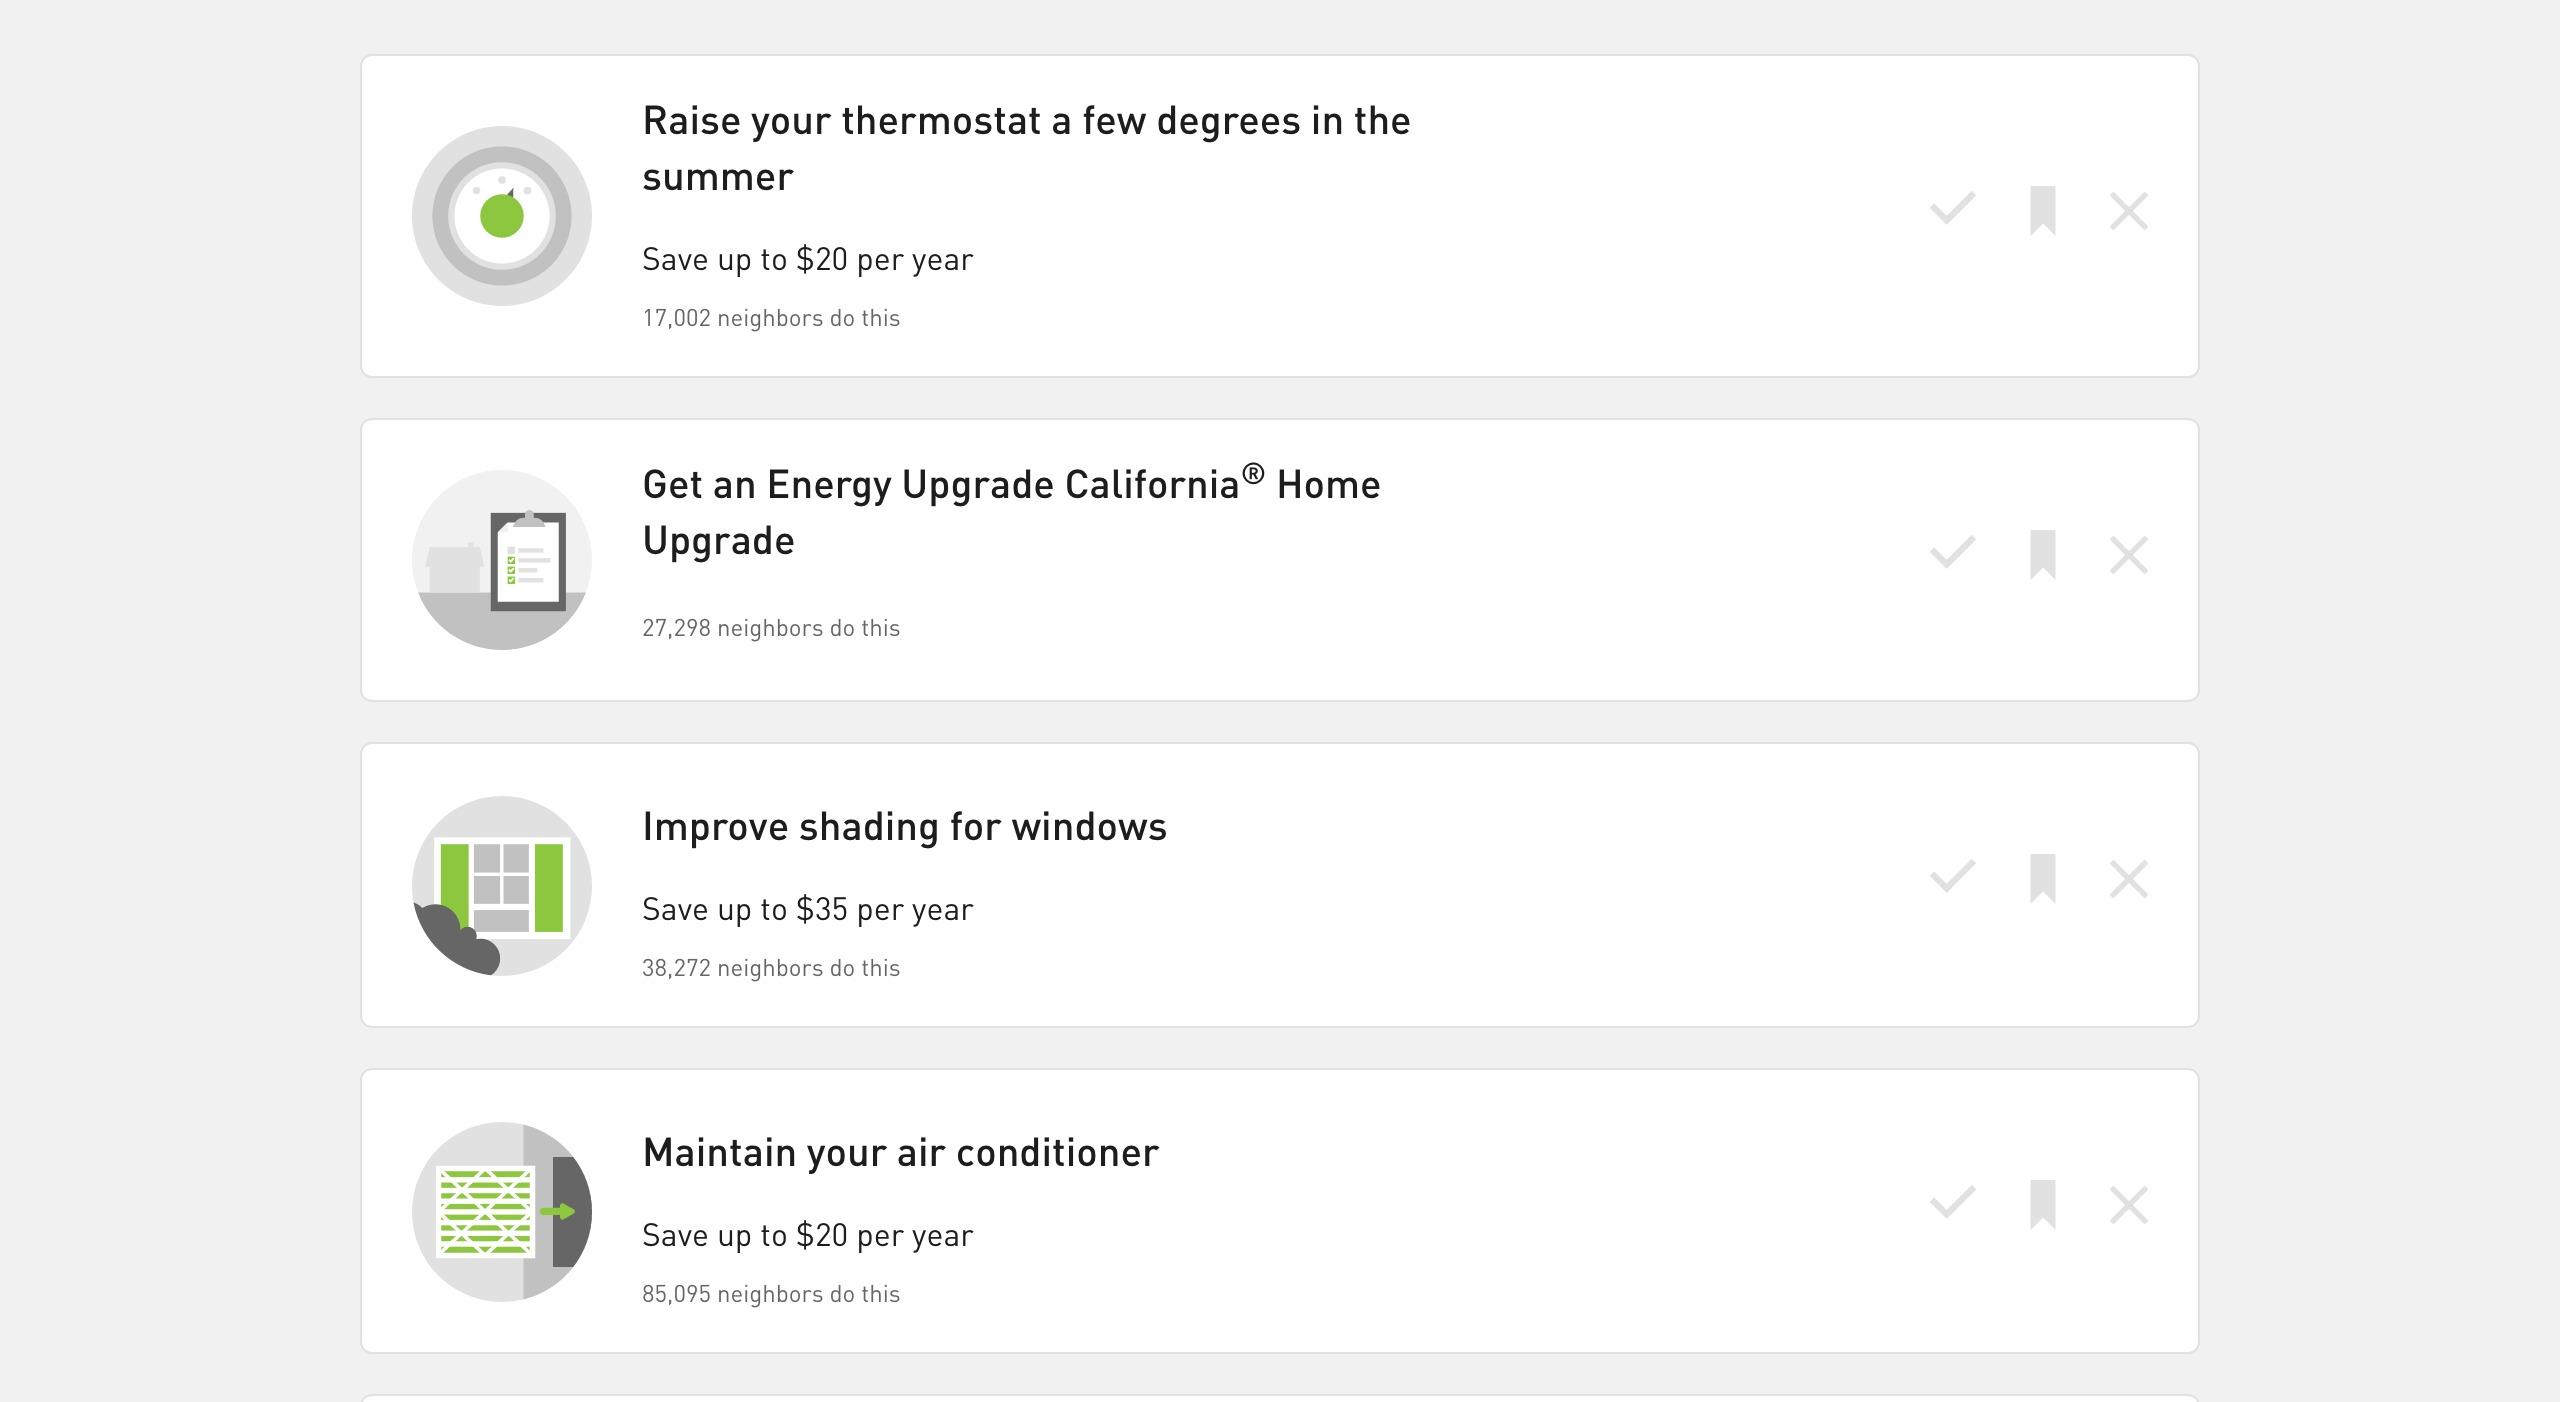 PG&E's Home Energy Checkup Tips